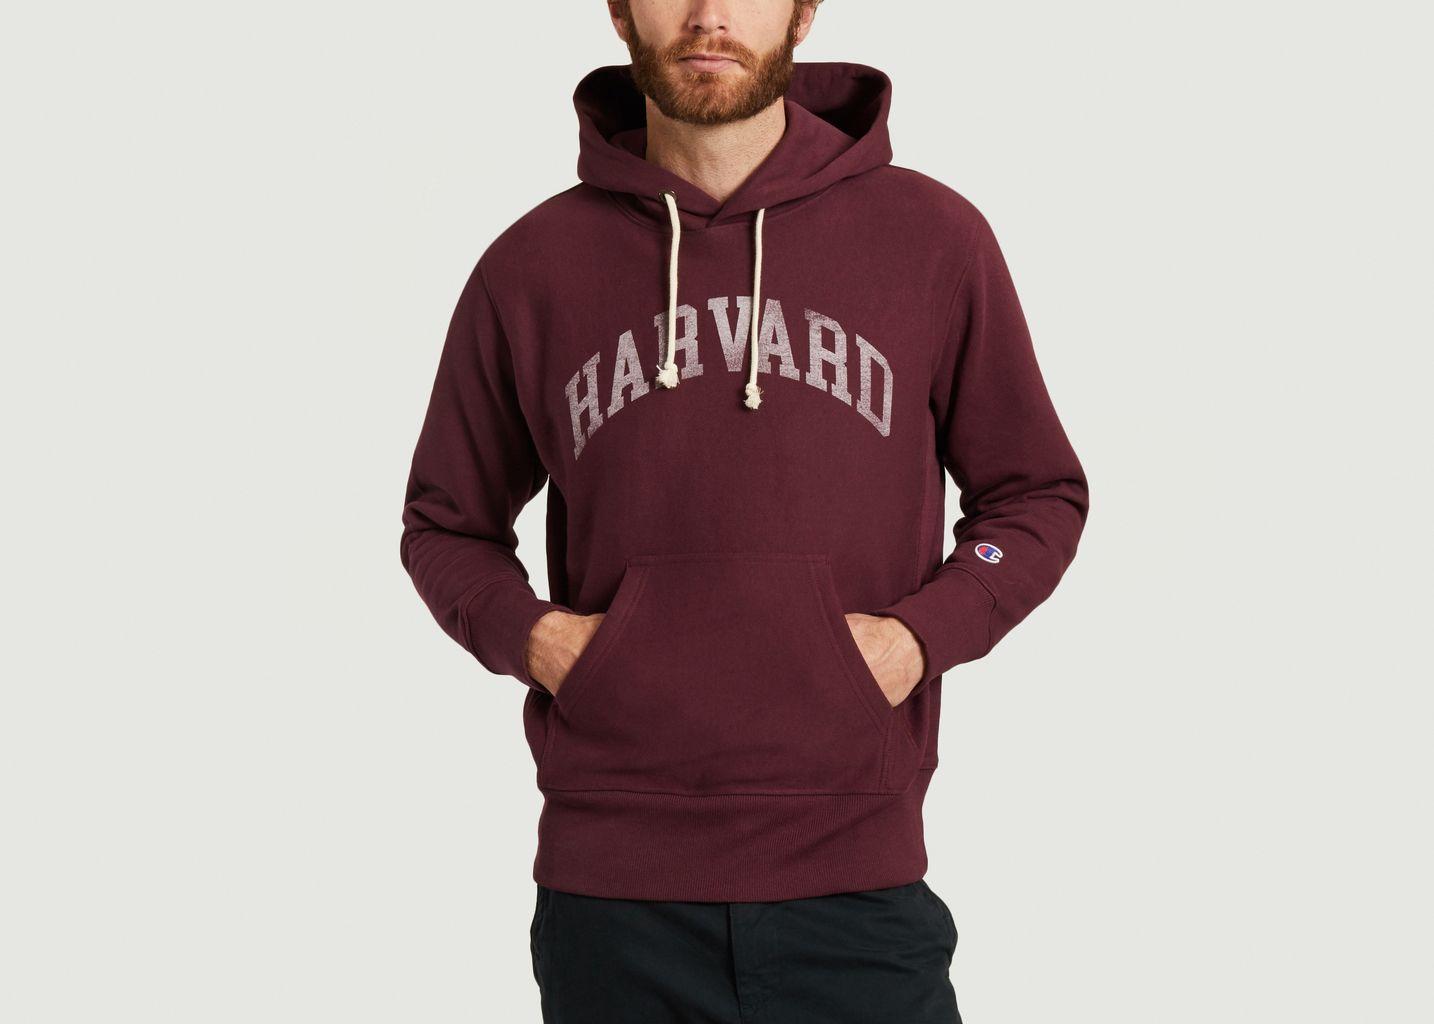 Sweatshirt à capuche Harvard - Champion